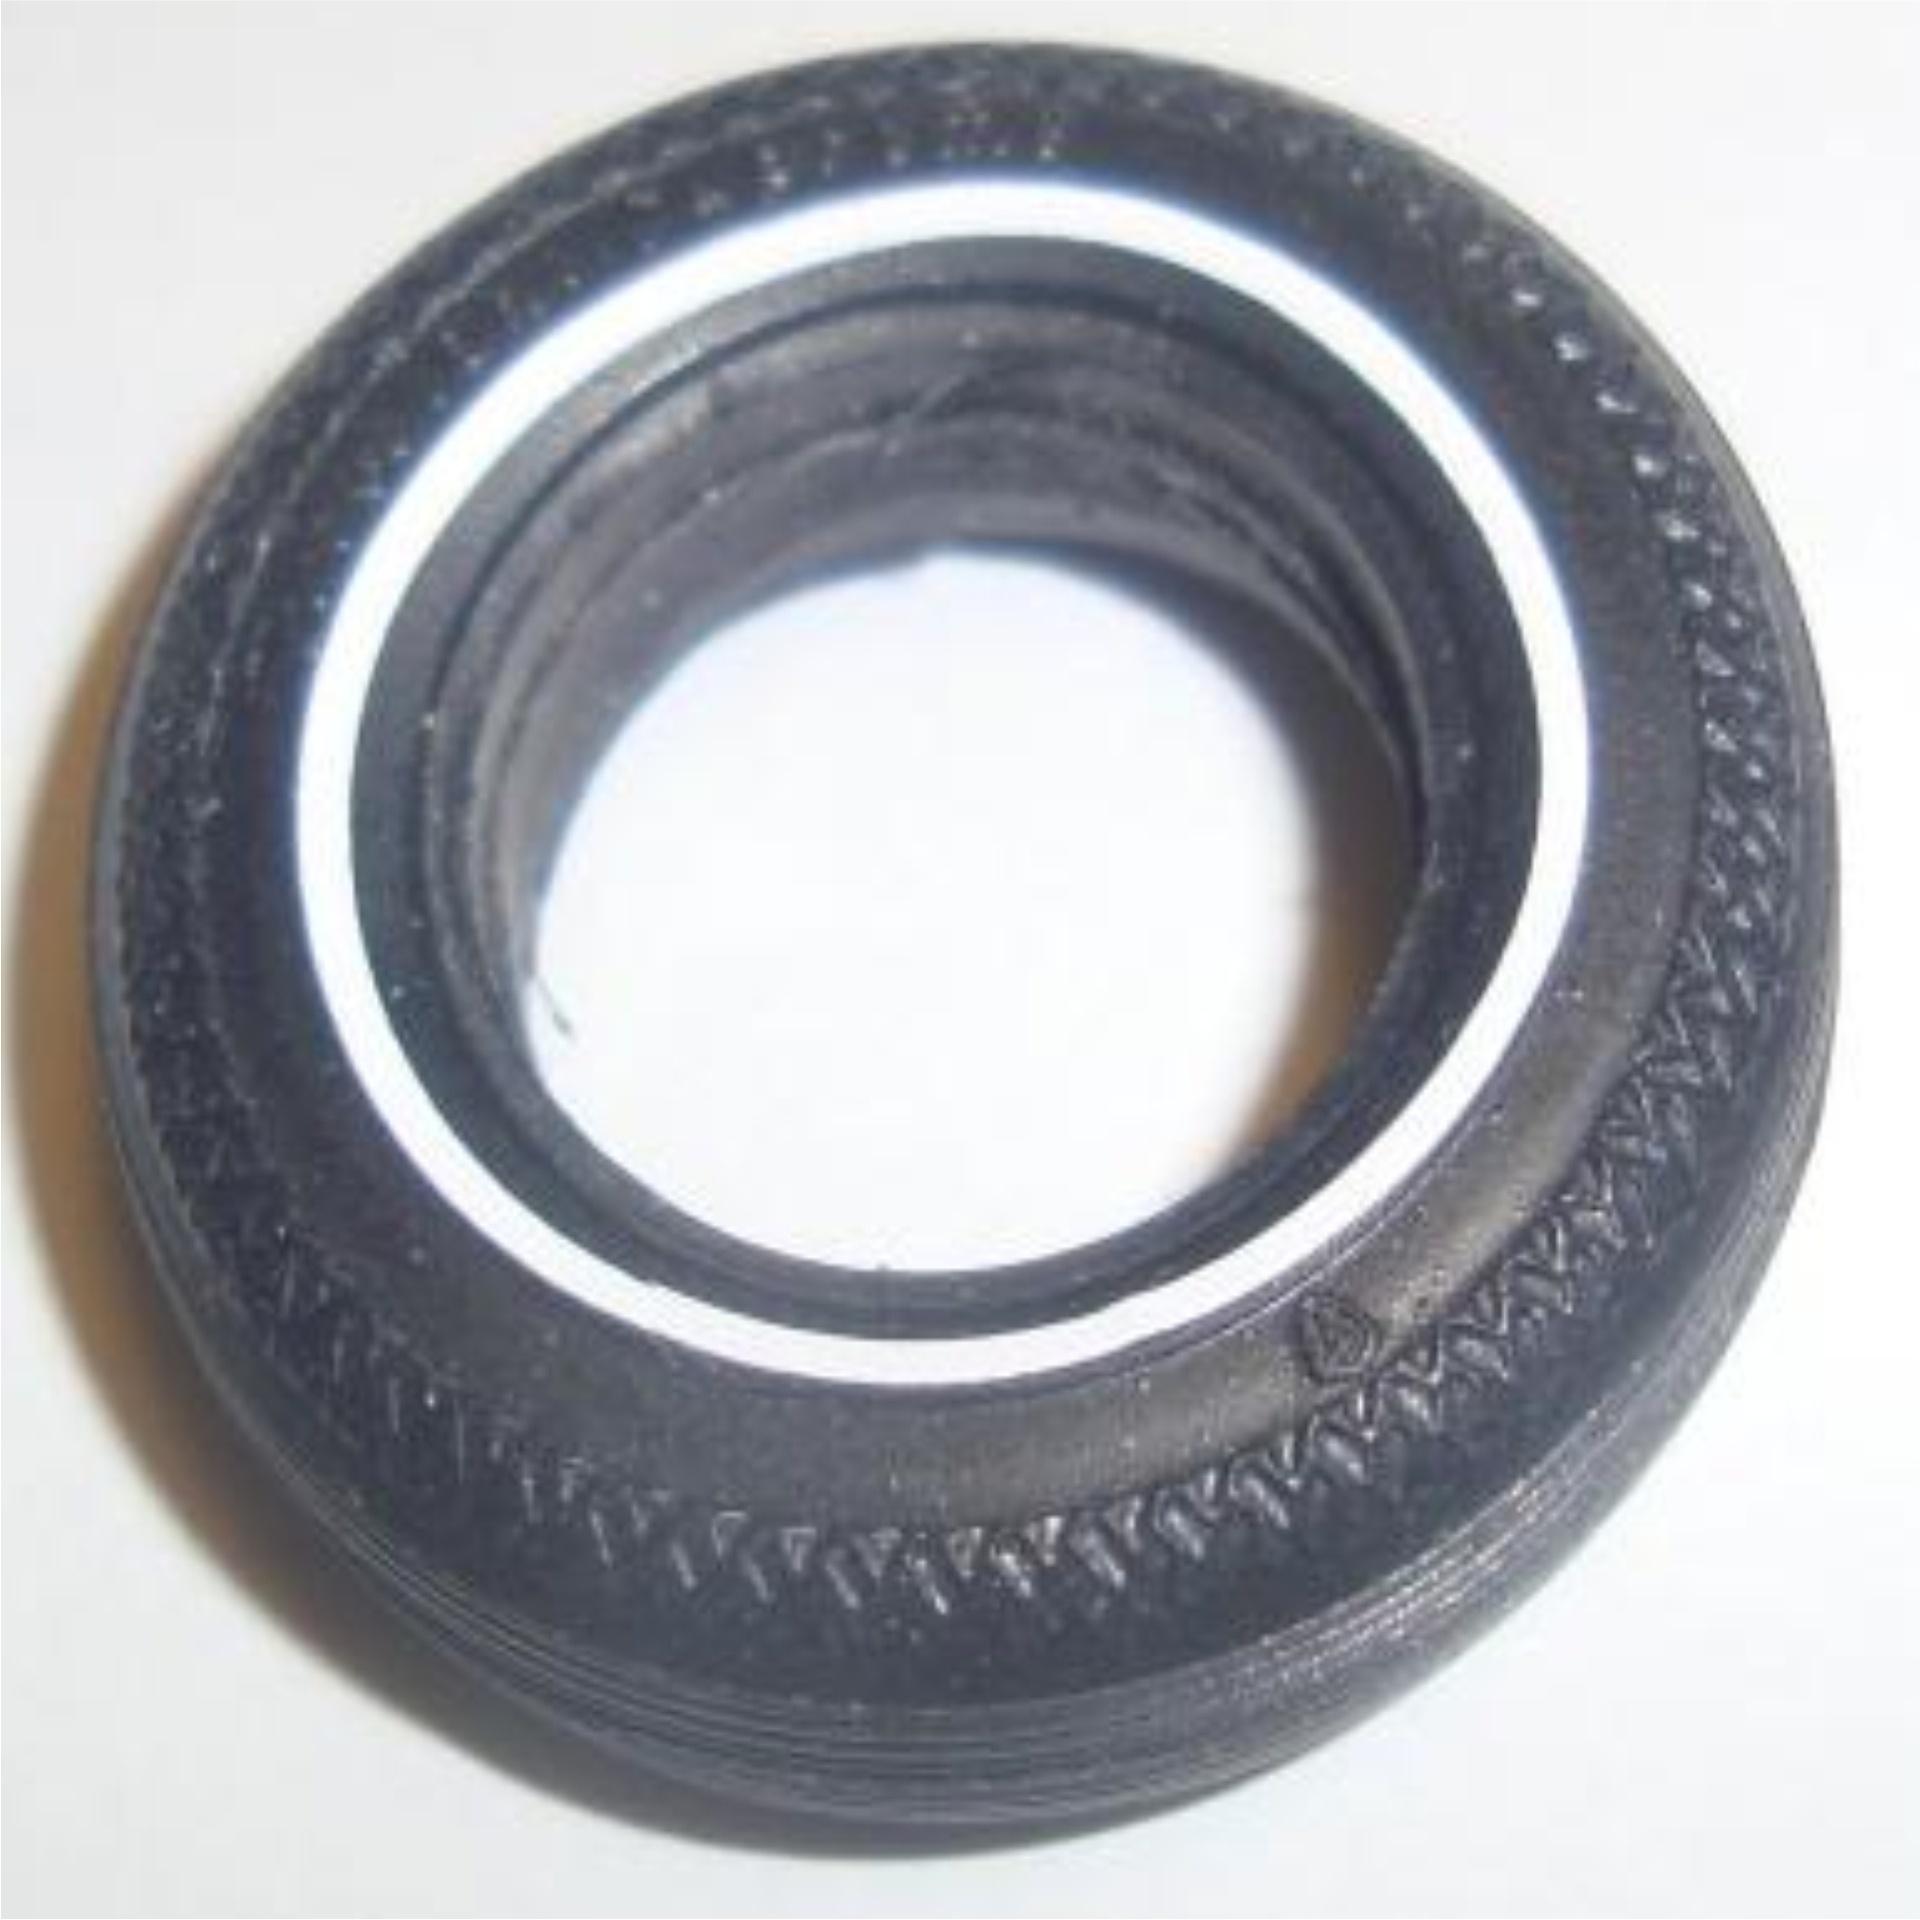 Vinyl Blueline Decals for AMT Firestone Supreme Tires